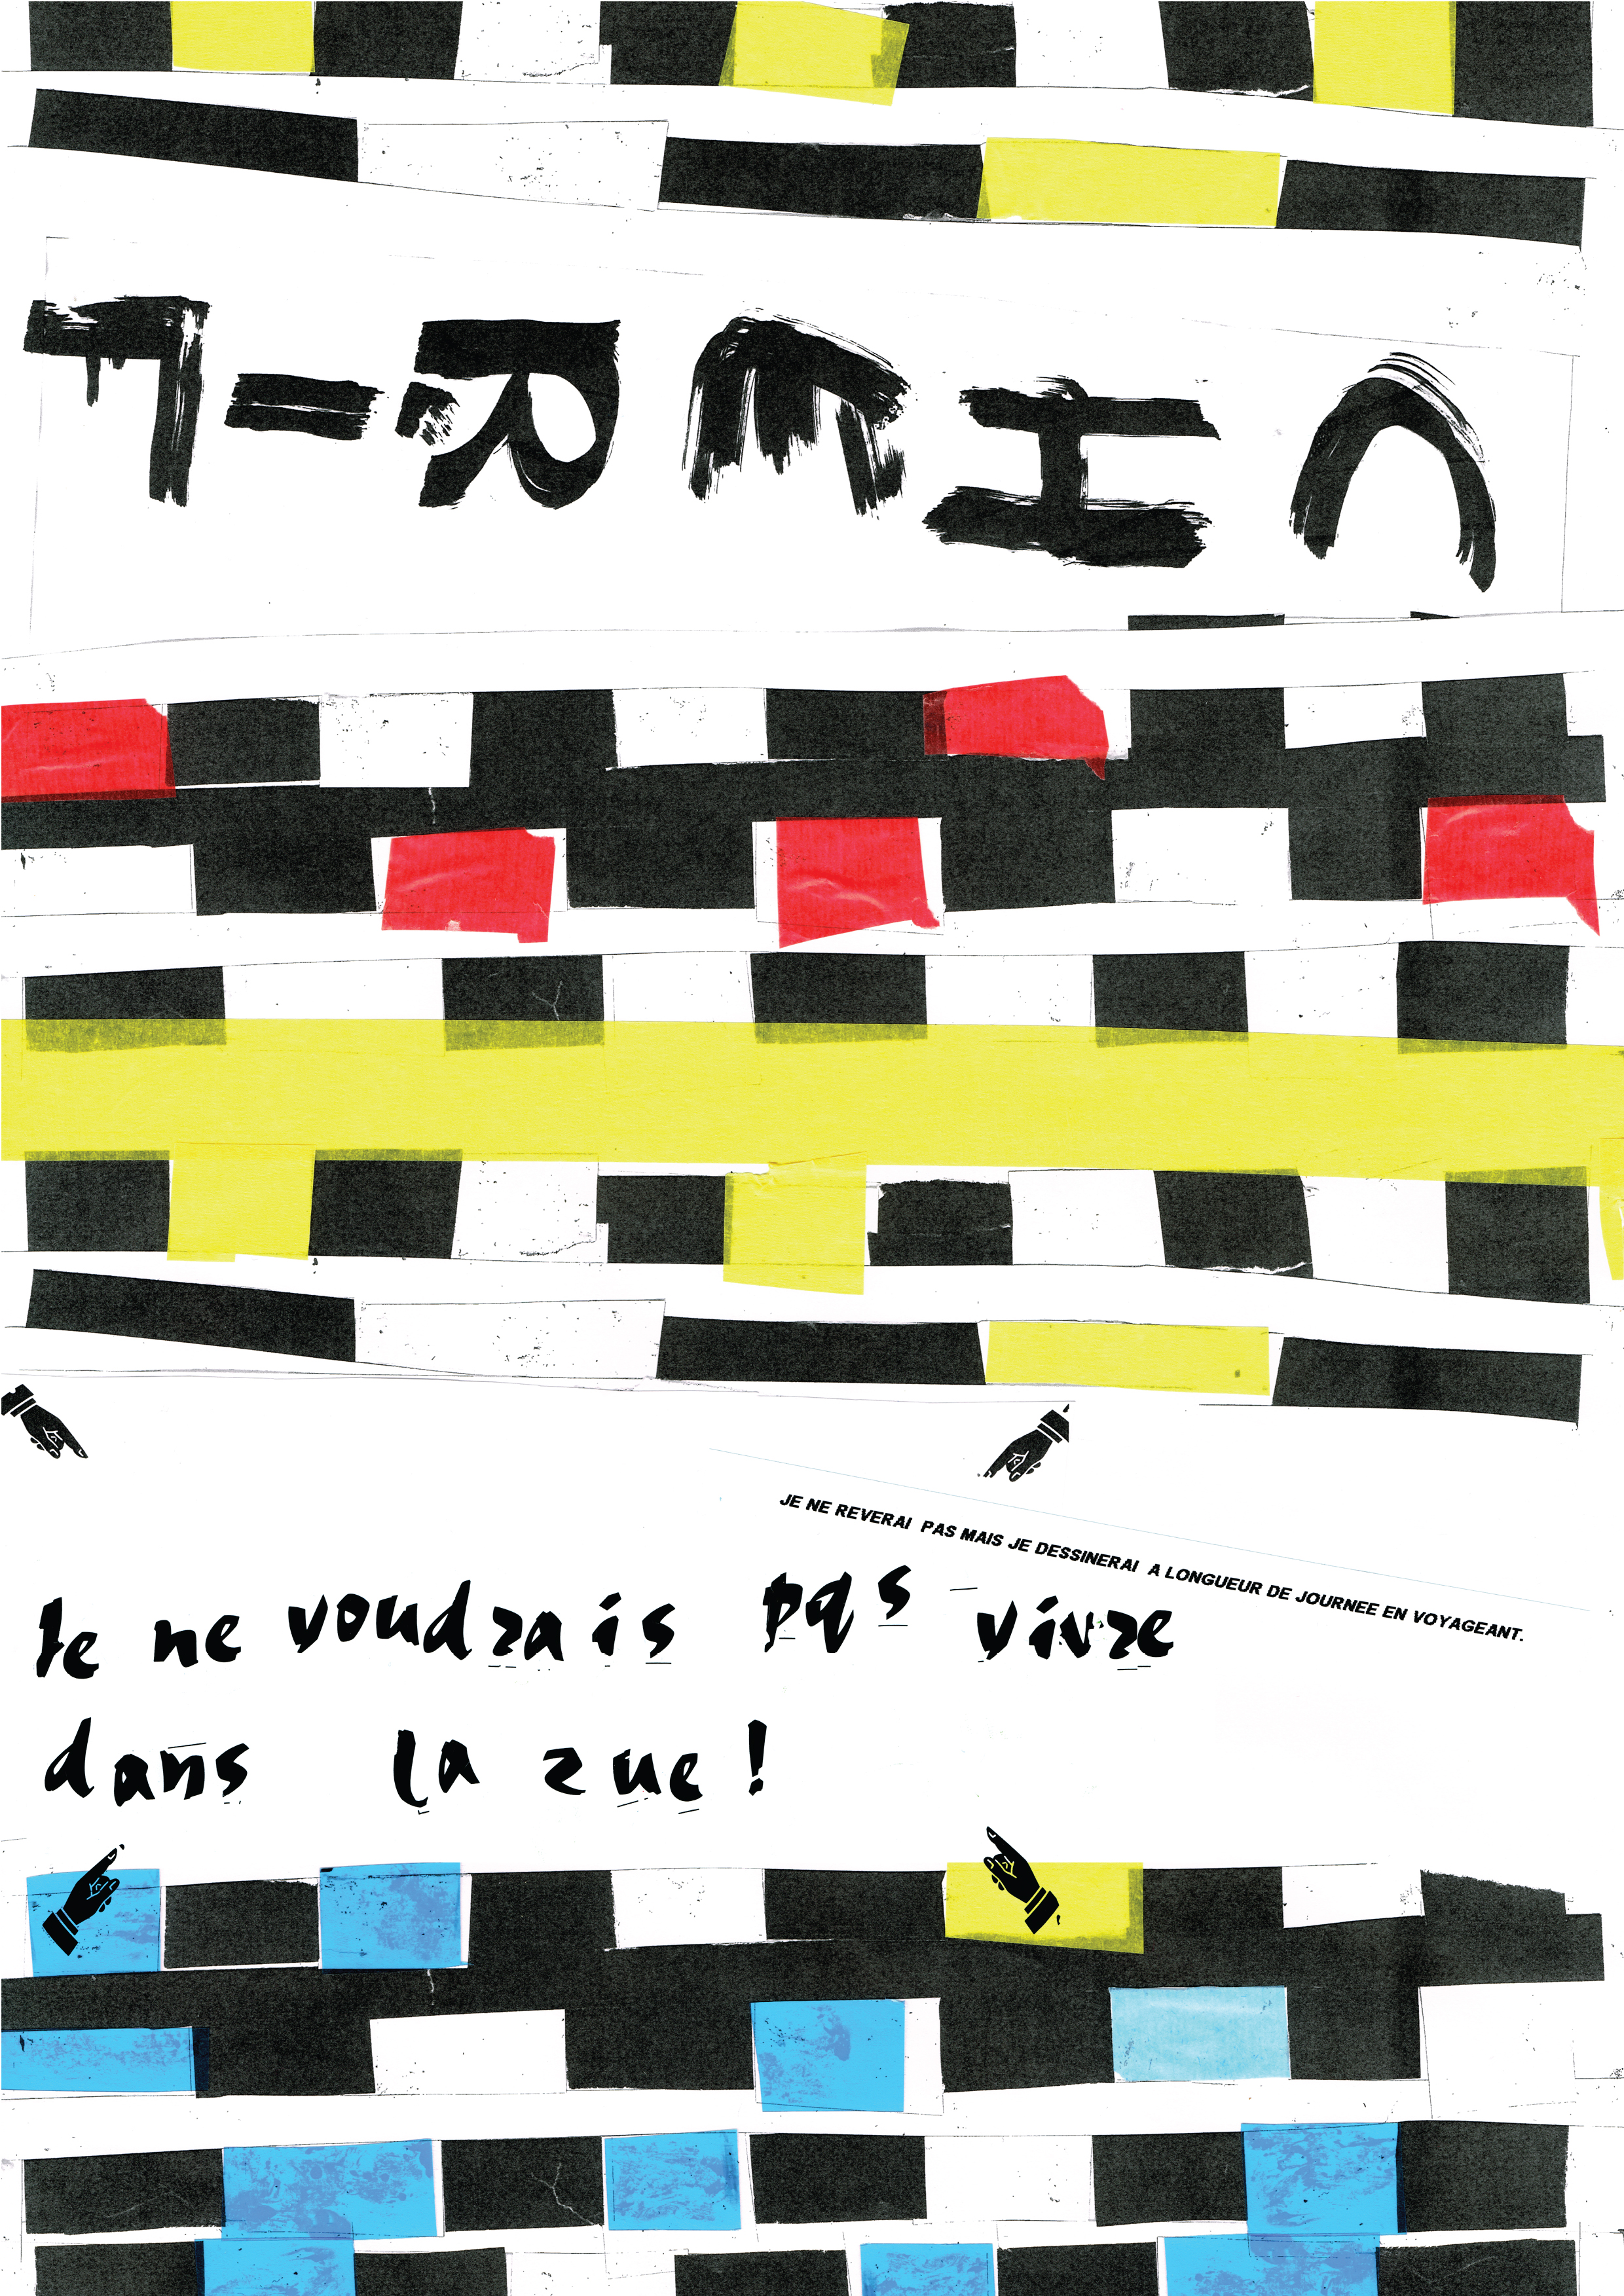 Affiche réalisée par Mohamed Chérif KARA.